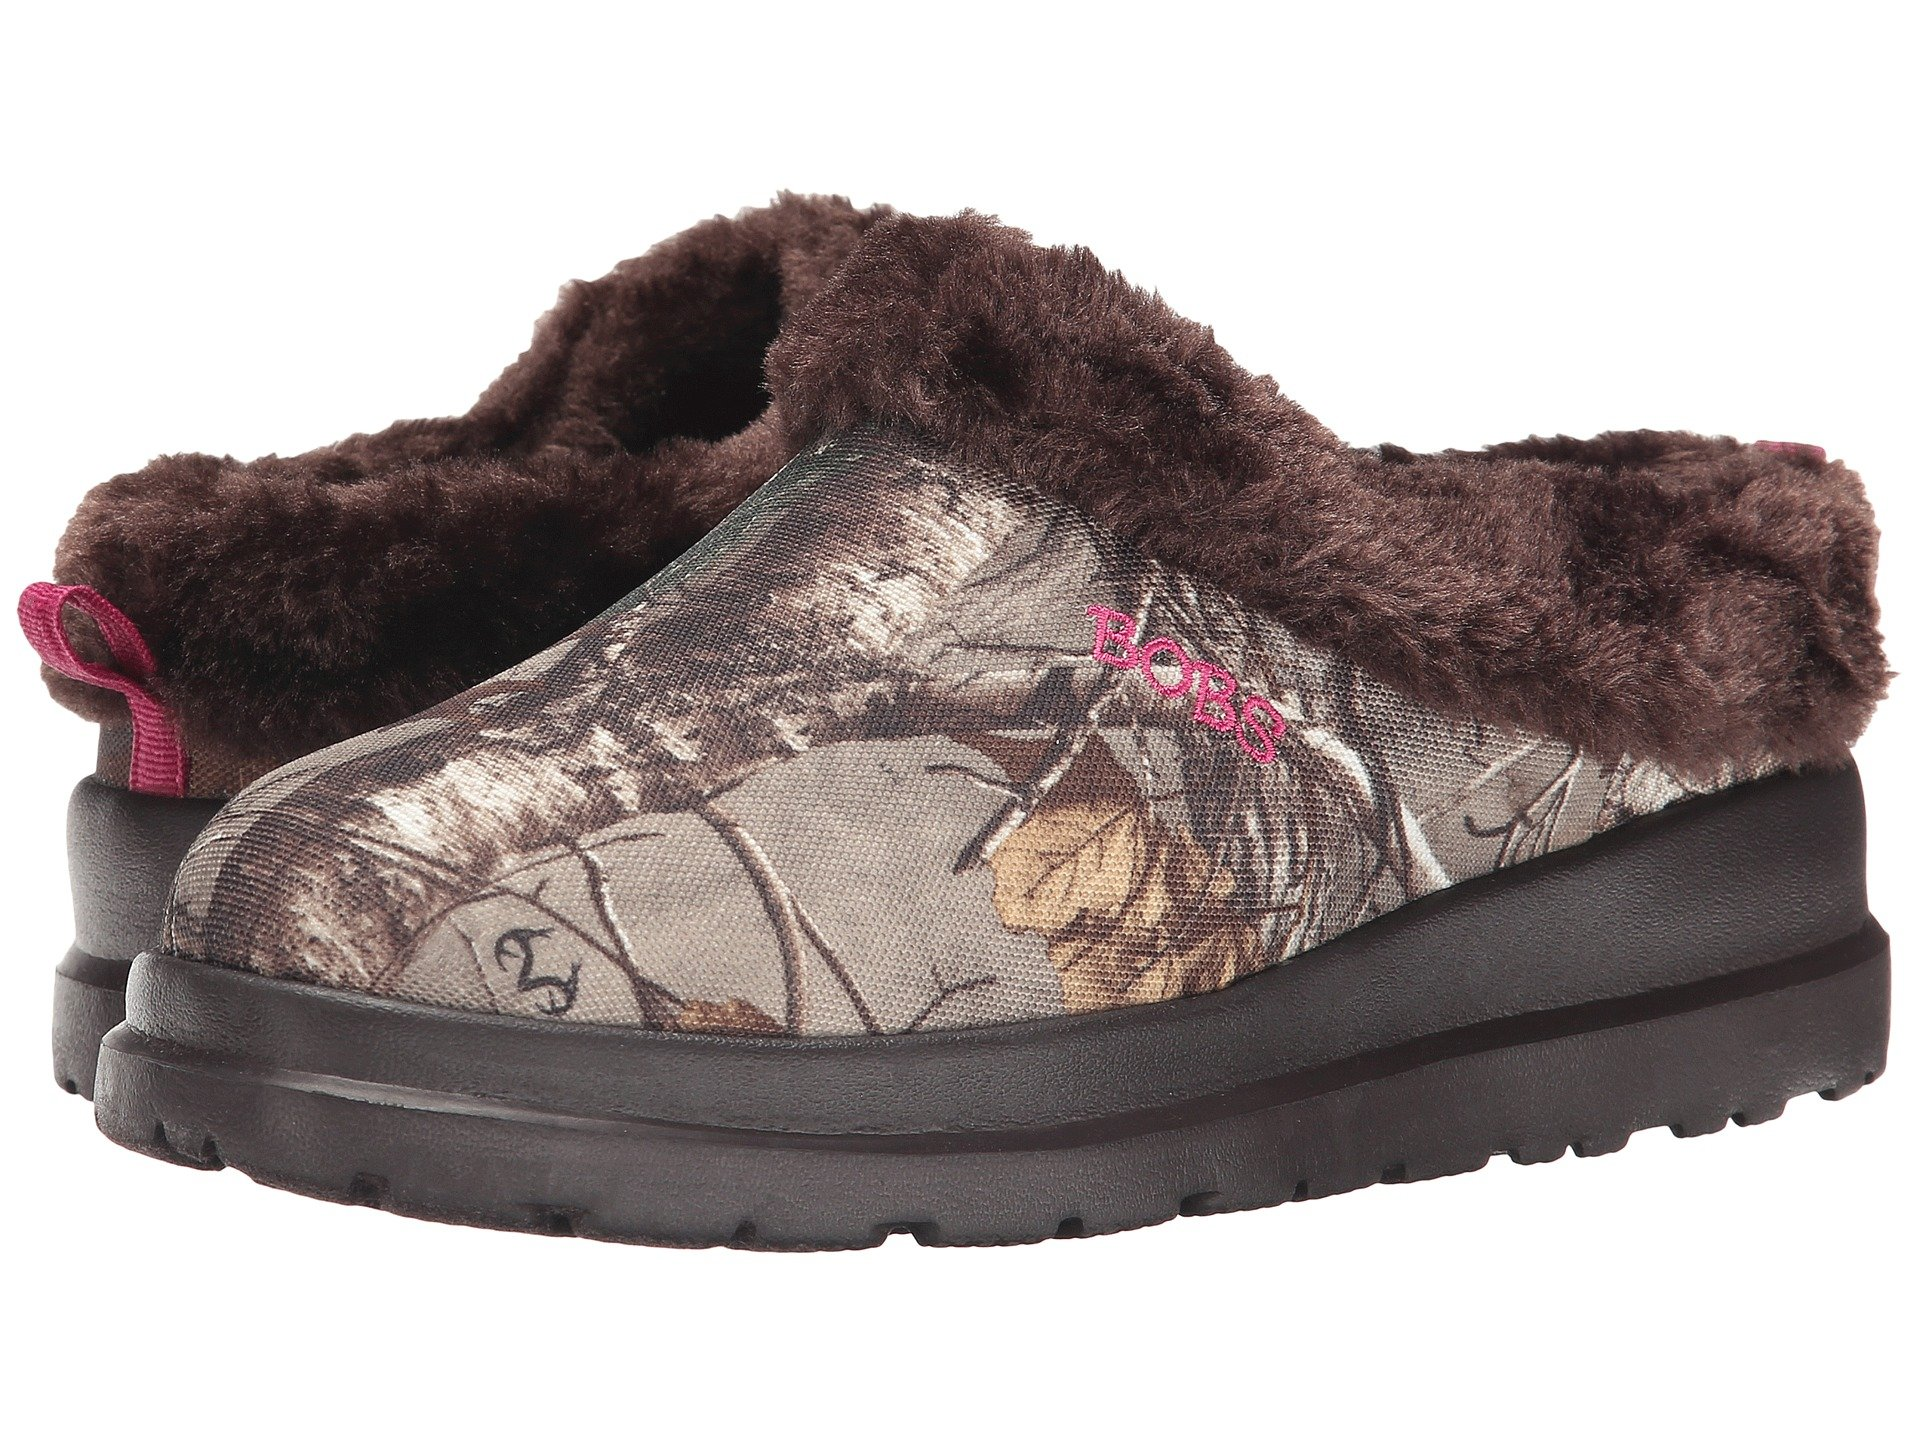 Zapato de Descanso para Mujer BOBS from SKECHERS Cherish - Snow Flake  + SKECHERS en VeoyCompro.net